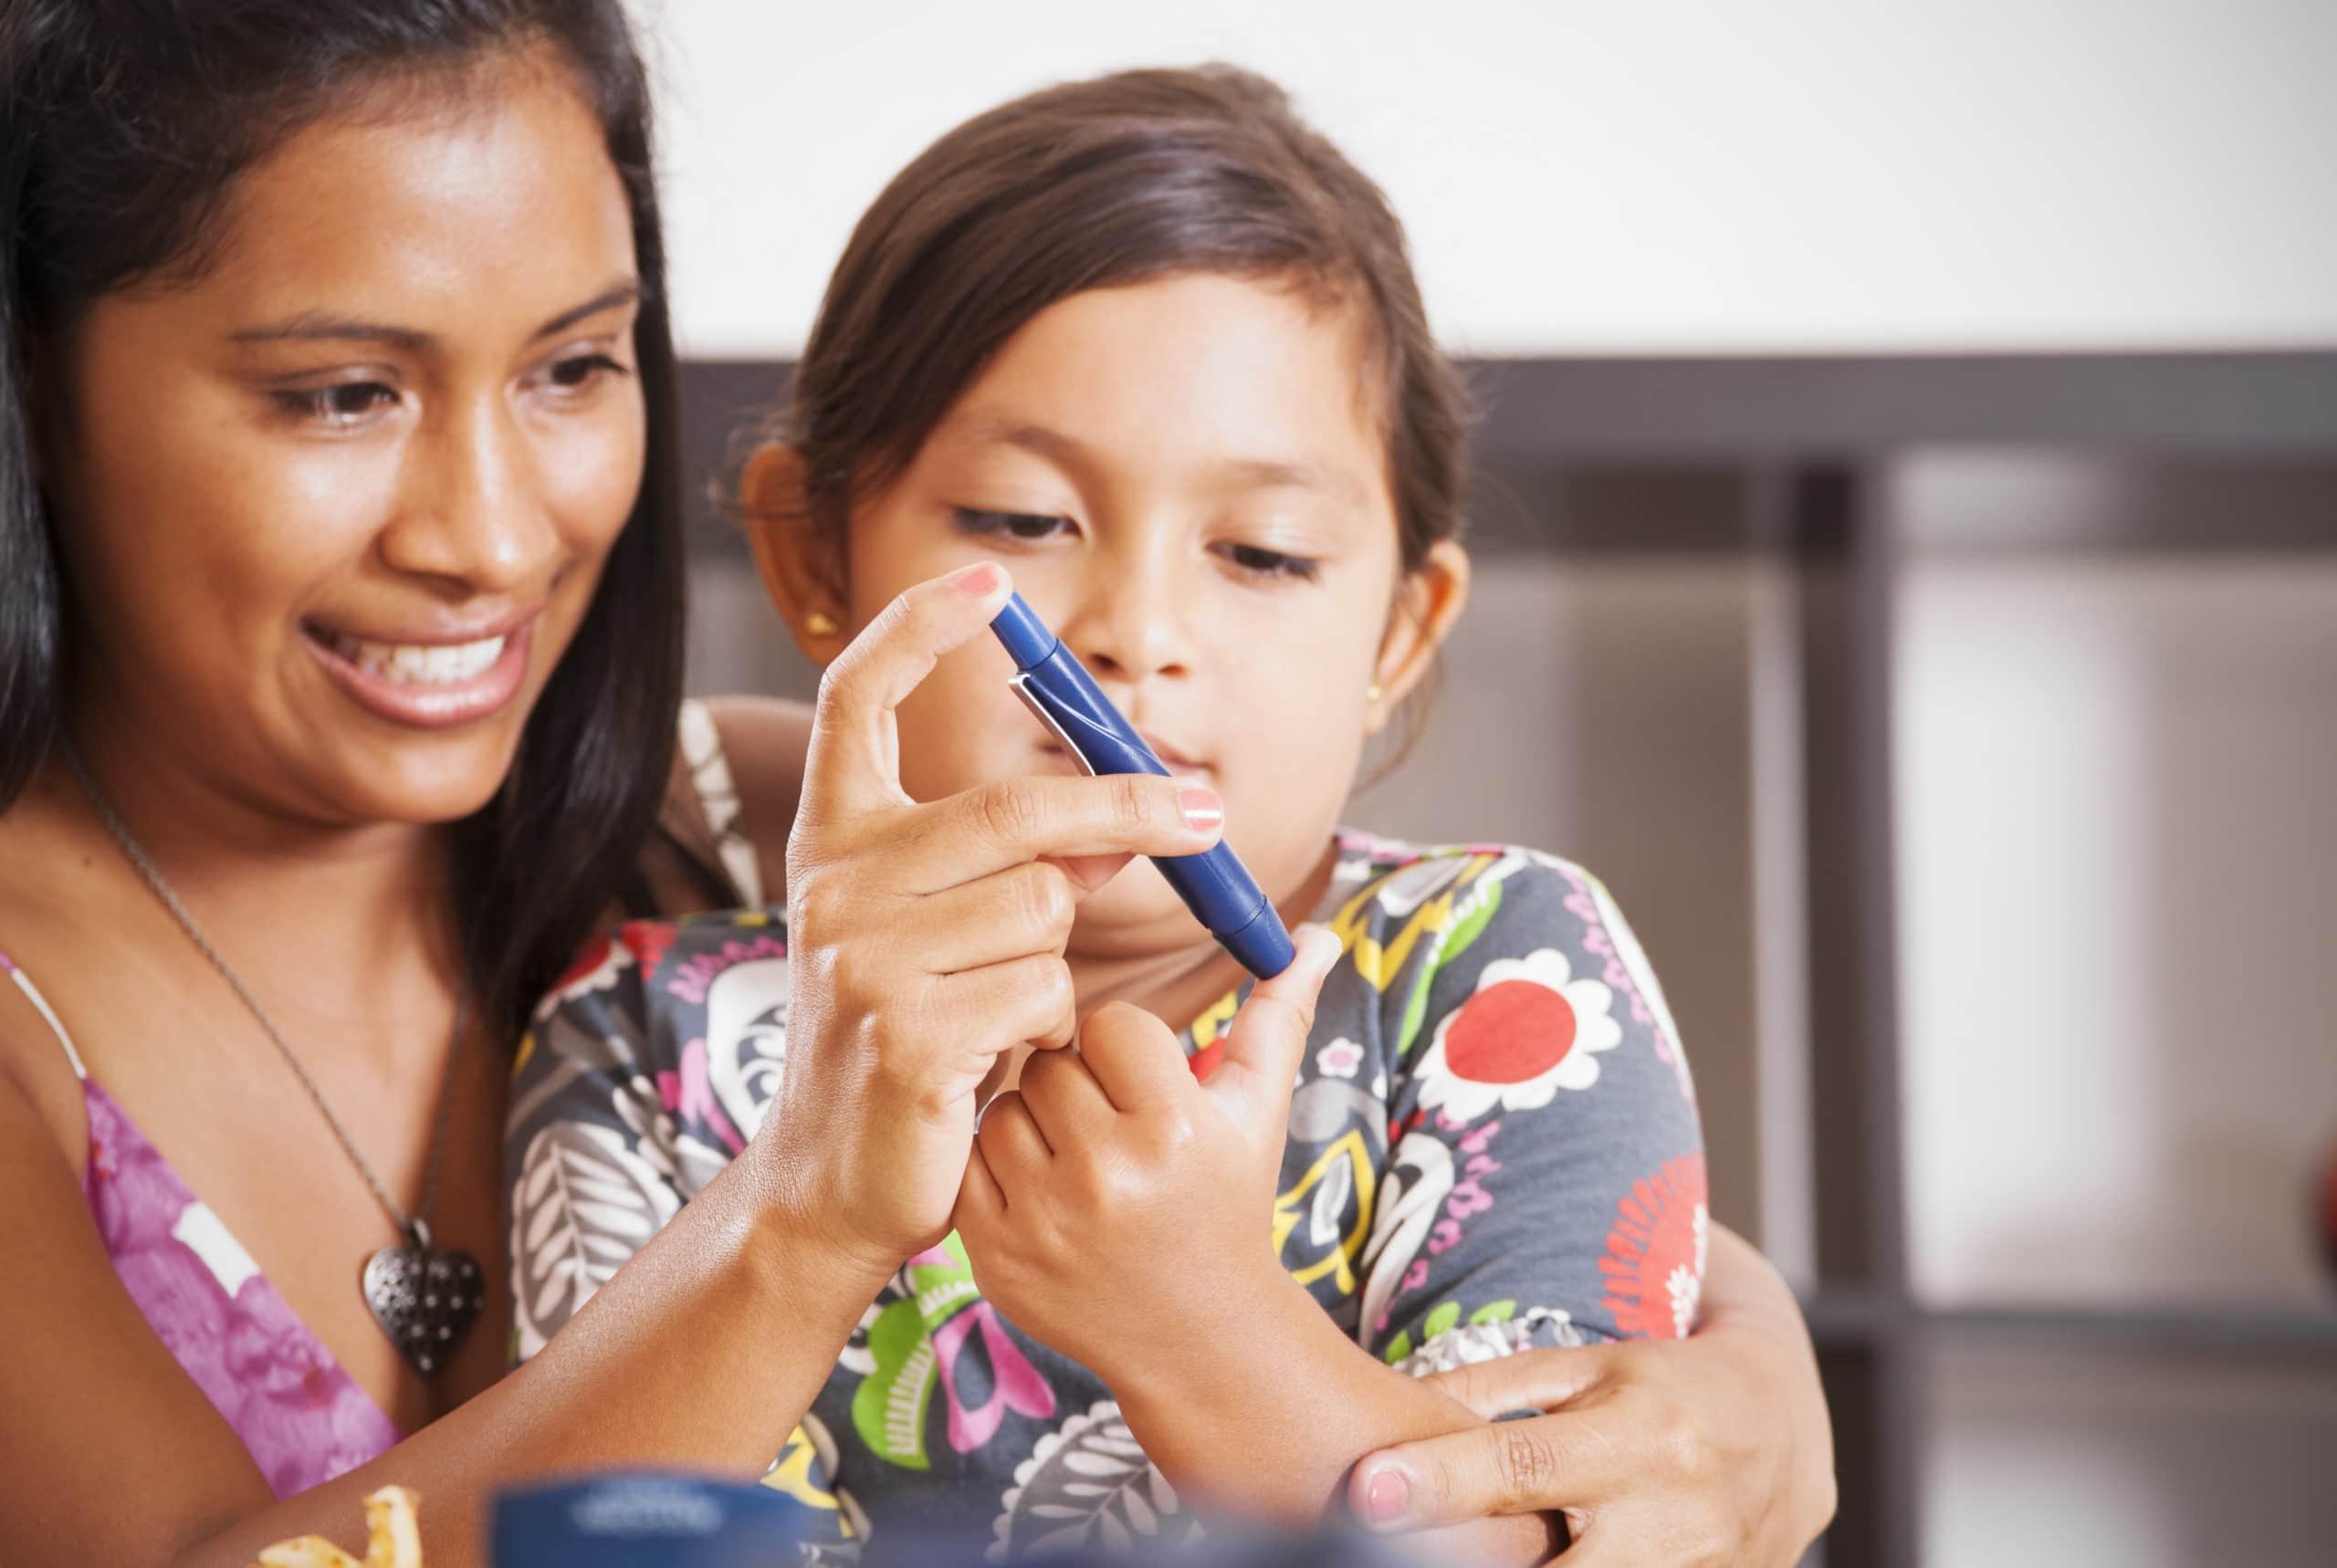 A mother helping her diabetic child monitor her blood sugar. Diabetes mellitus type 1, Juvenile diabetes.